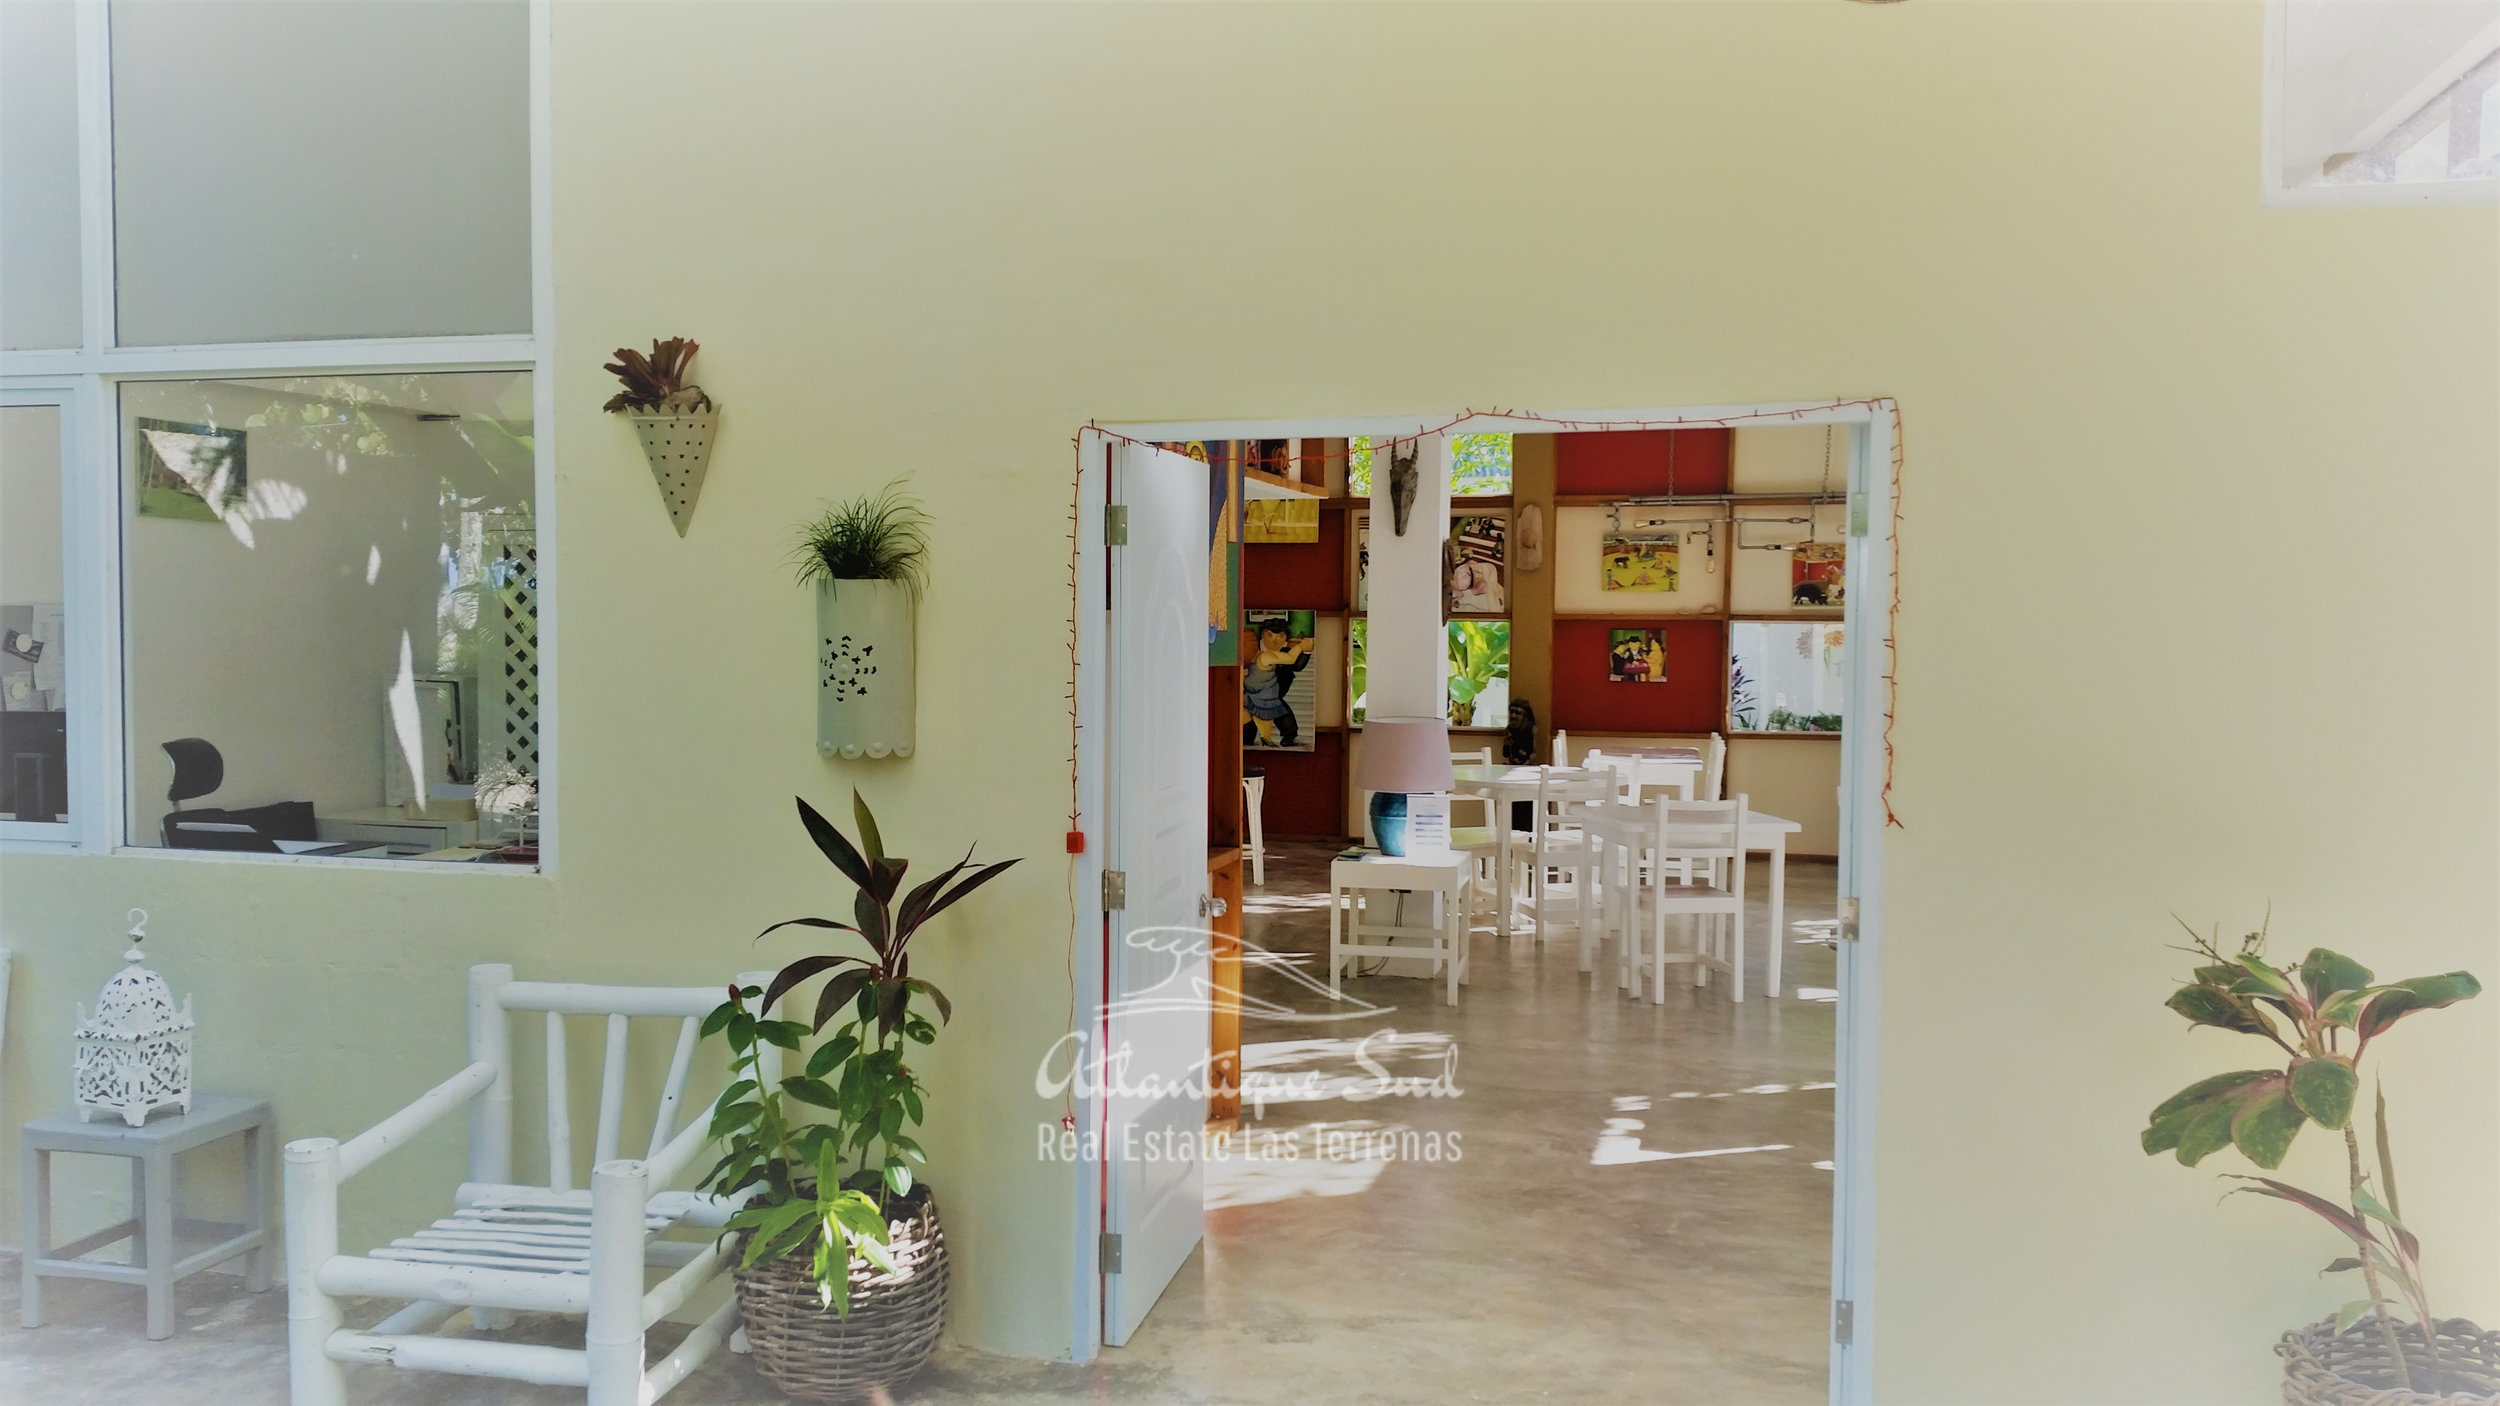 Small hotel for sale next to the beach Real Estate Las Terrenas Atlantique Sud Dominican Republic1.jpg